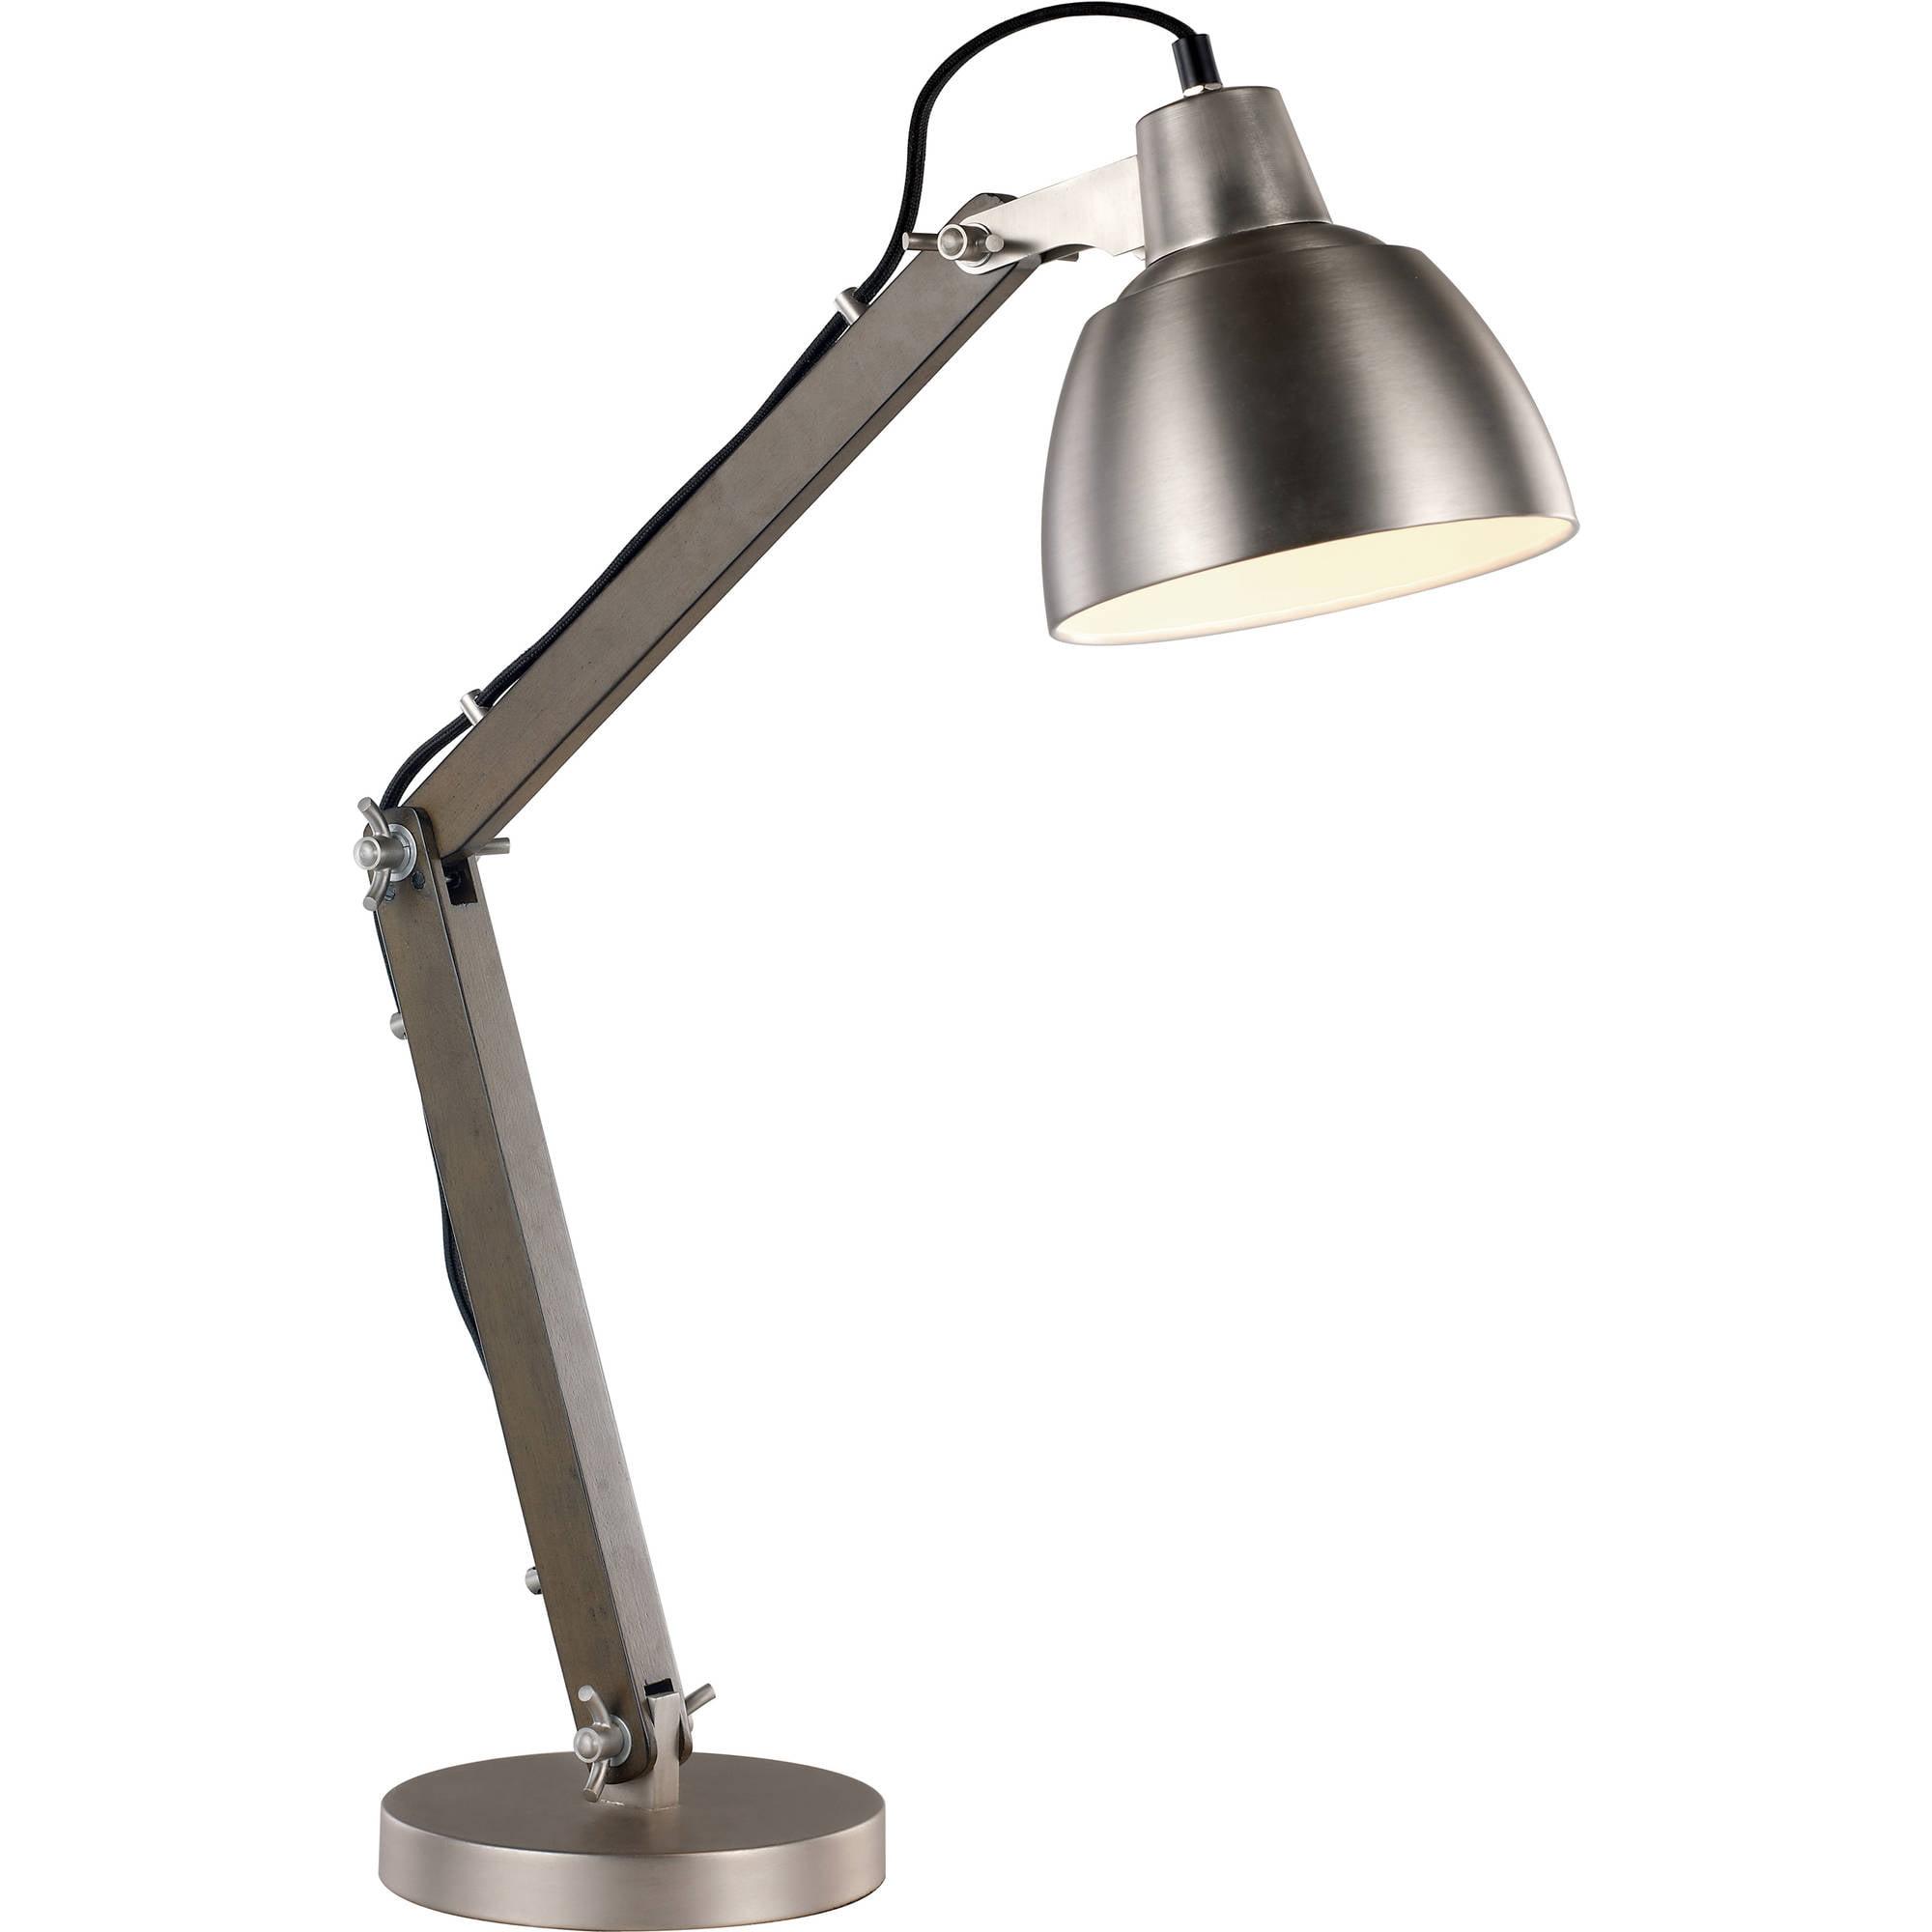 Bel Air Classic Industrial Task Table Lamp Satin Nickel Wood